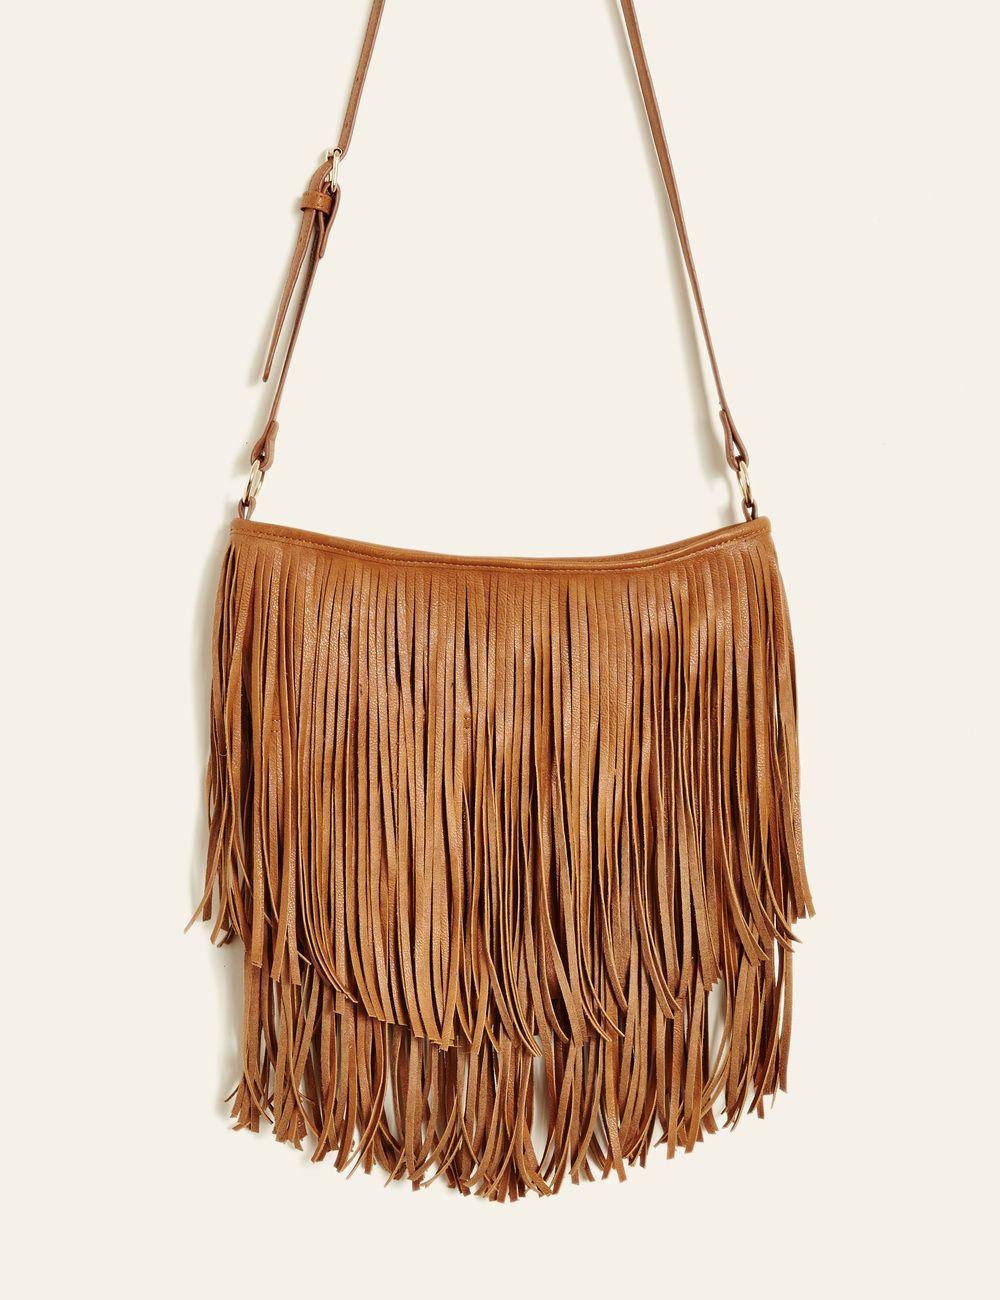 Sac à franges camel femme • Jennyfer   bijoux.....DIY ... 63d5ac16413c